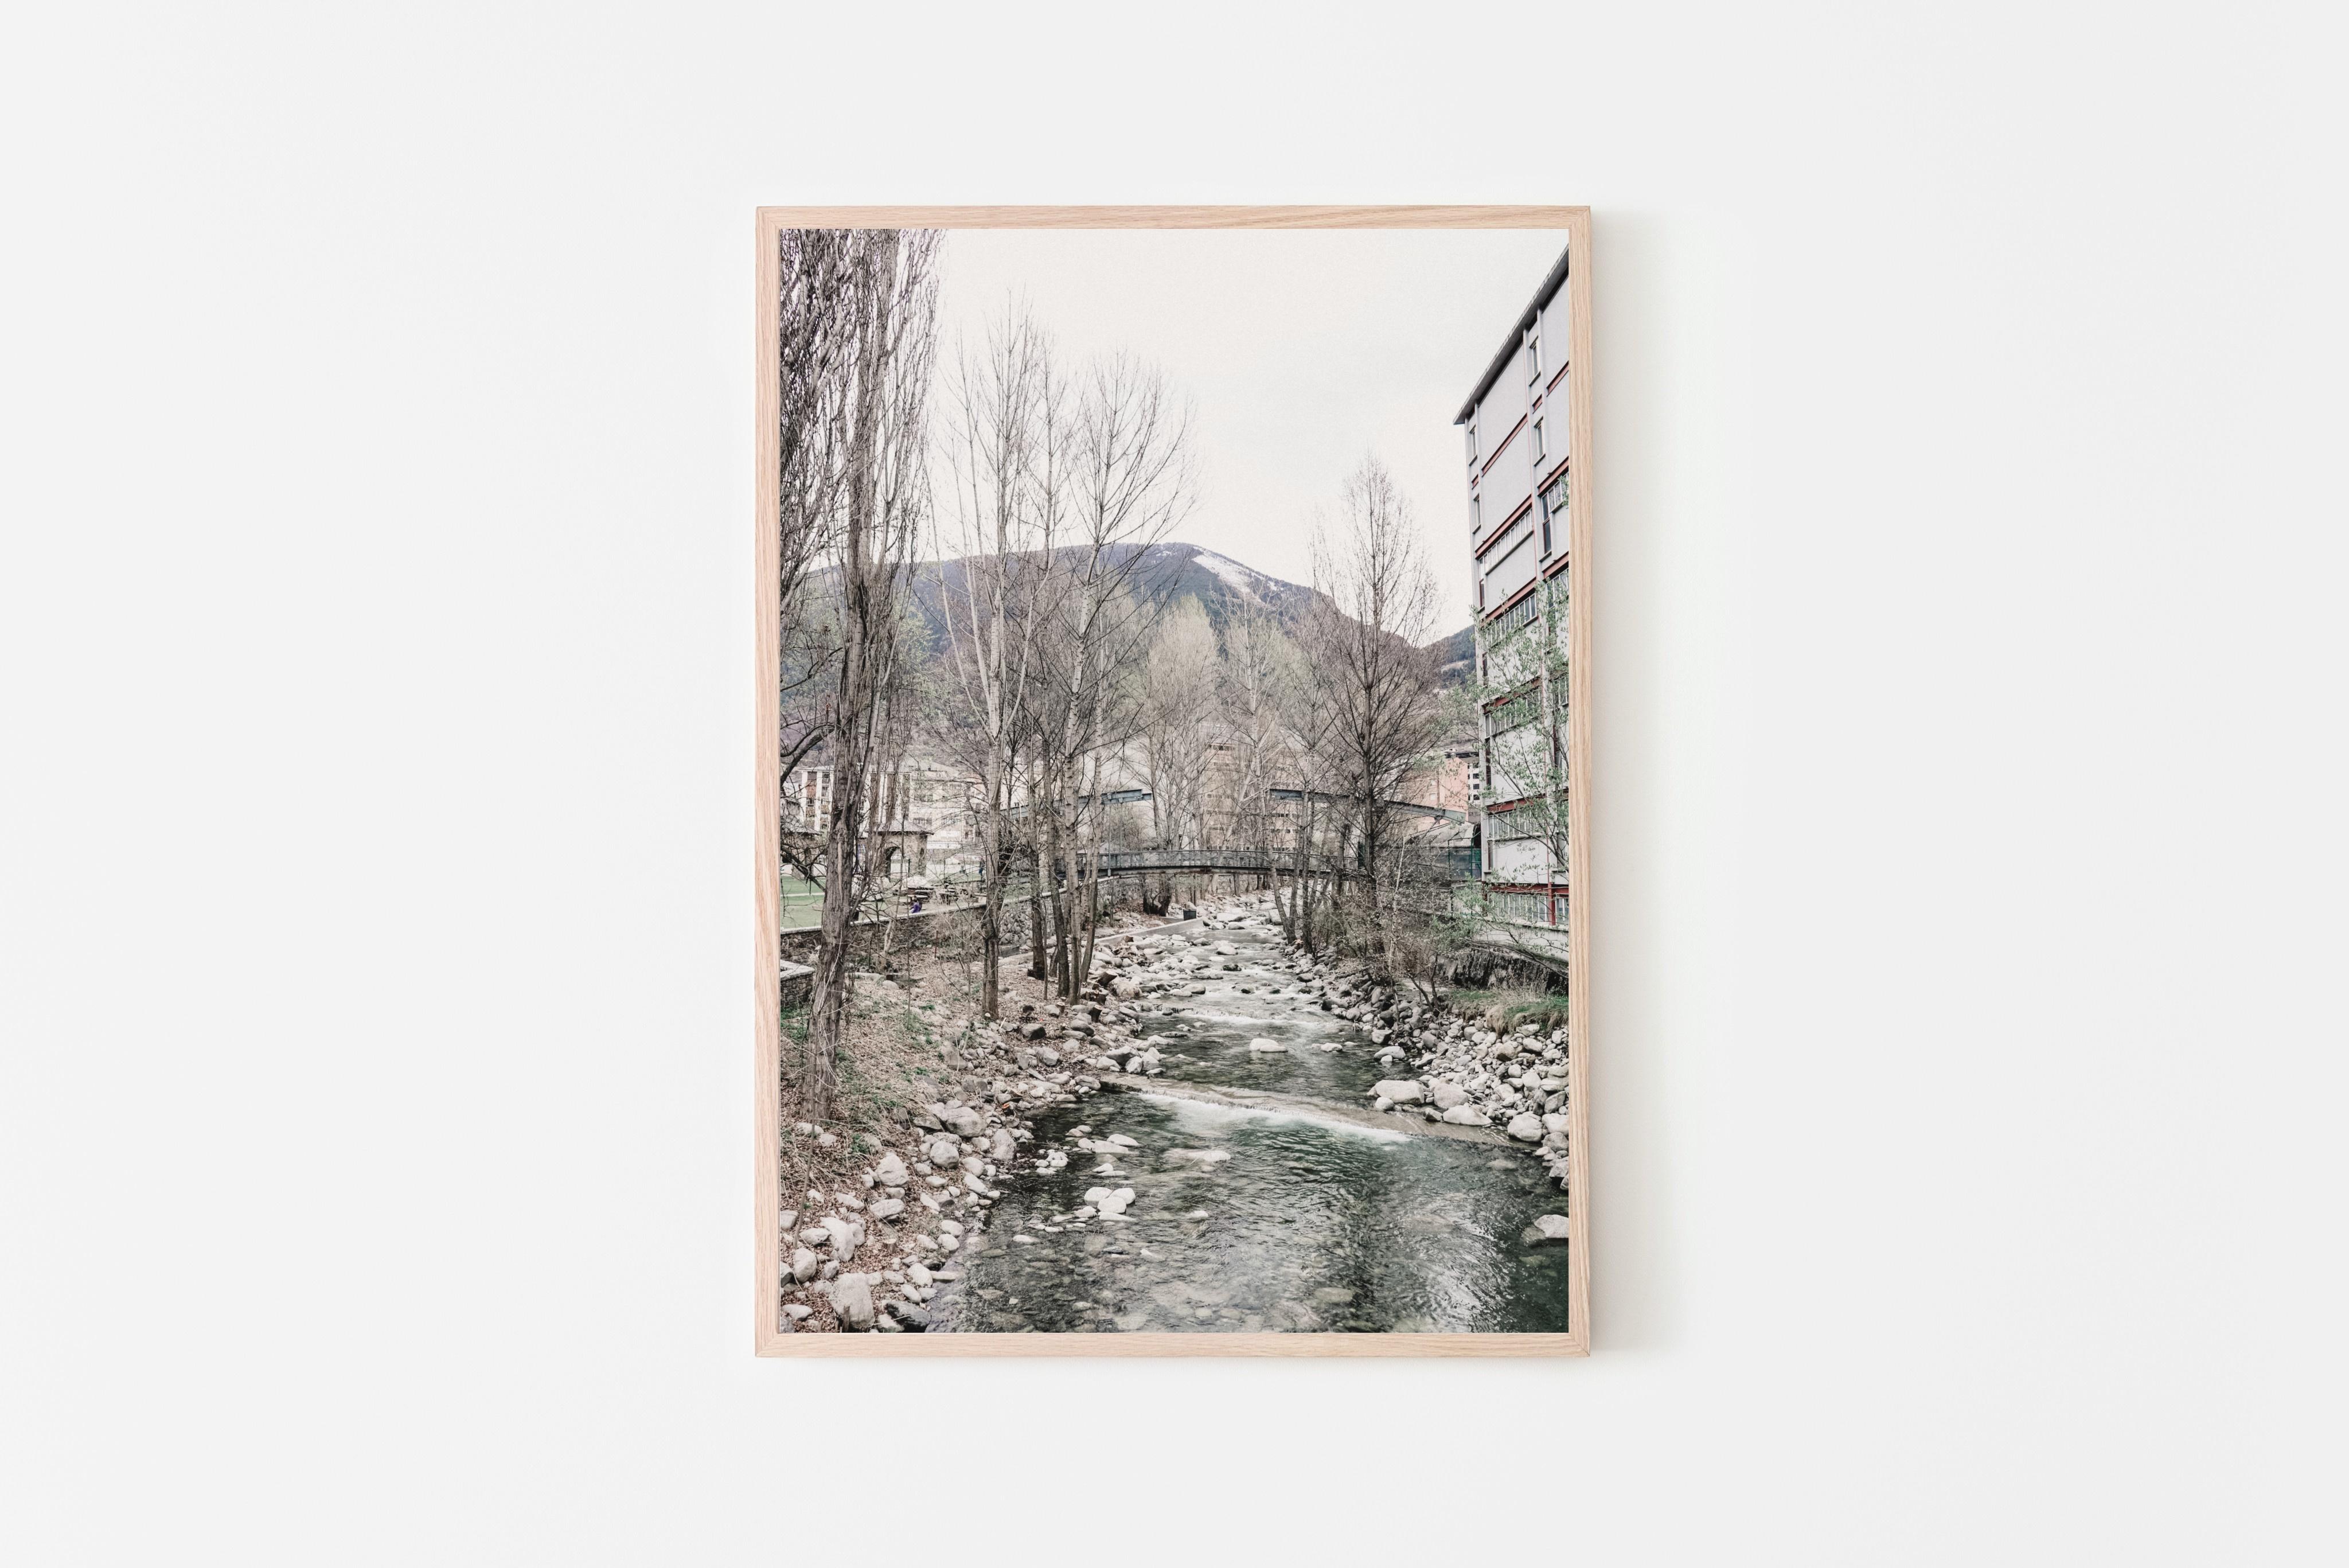 andorra river stream wall print